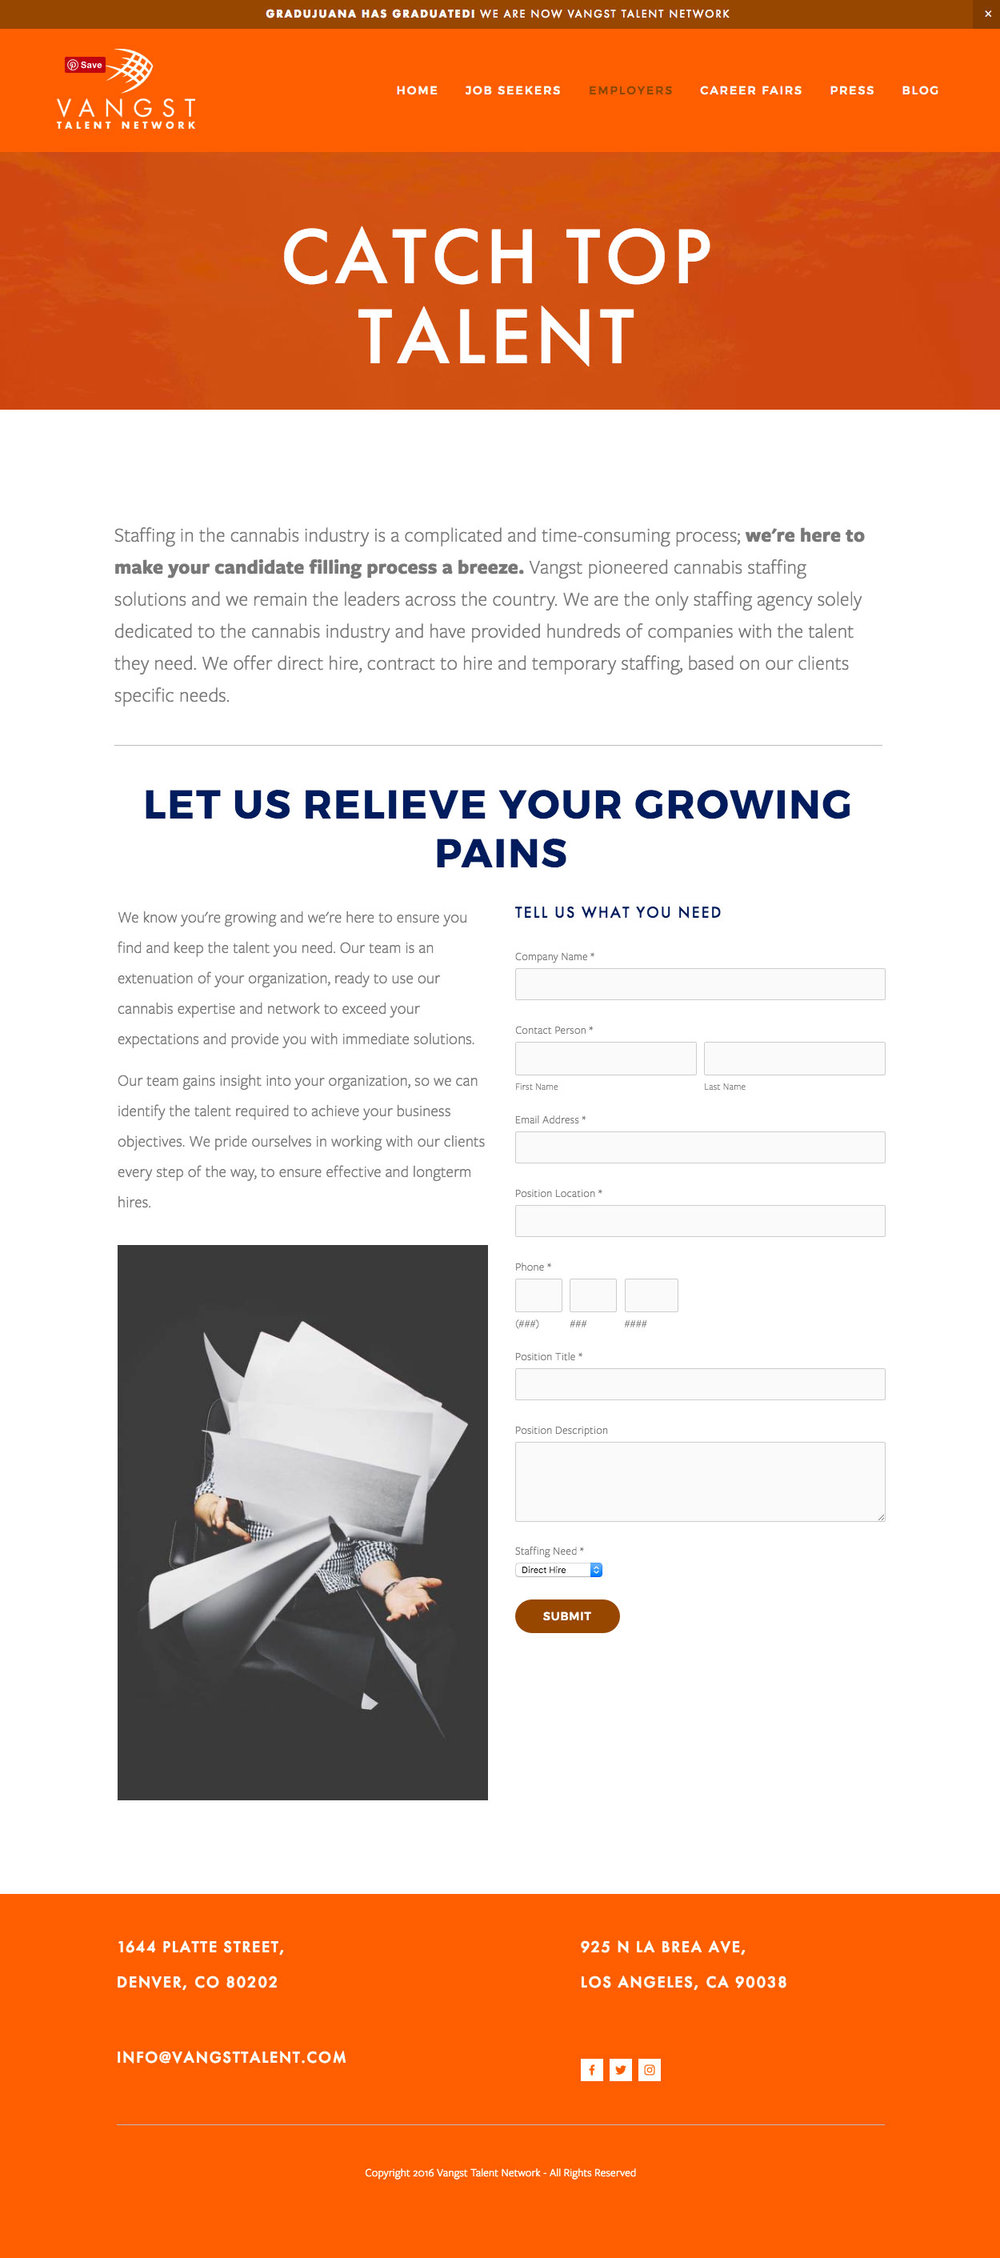 vangst-talent-website-preview-kristen-williams-designs